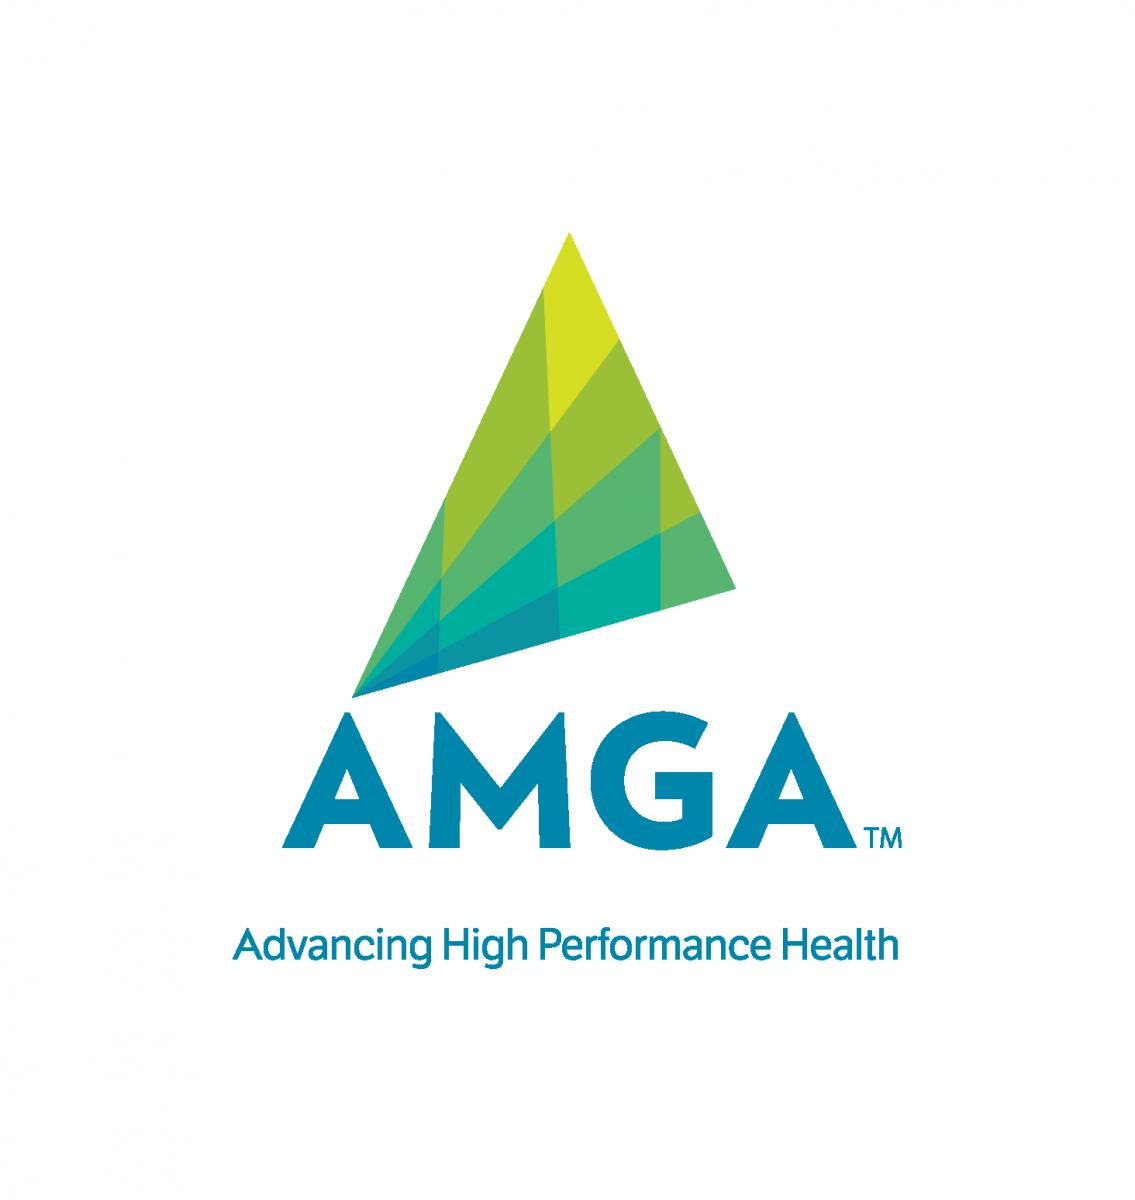 AMGA logo